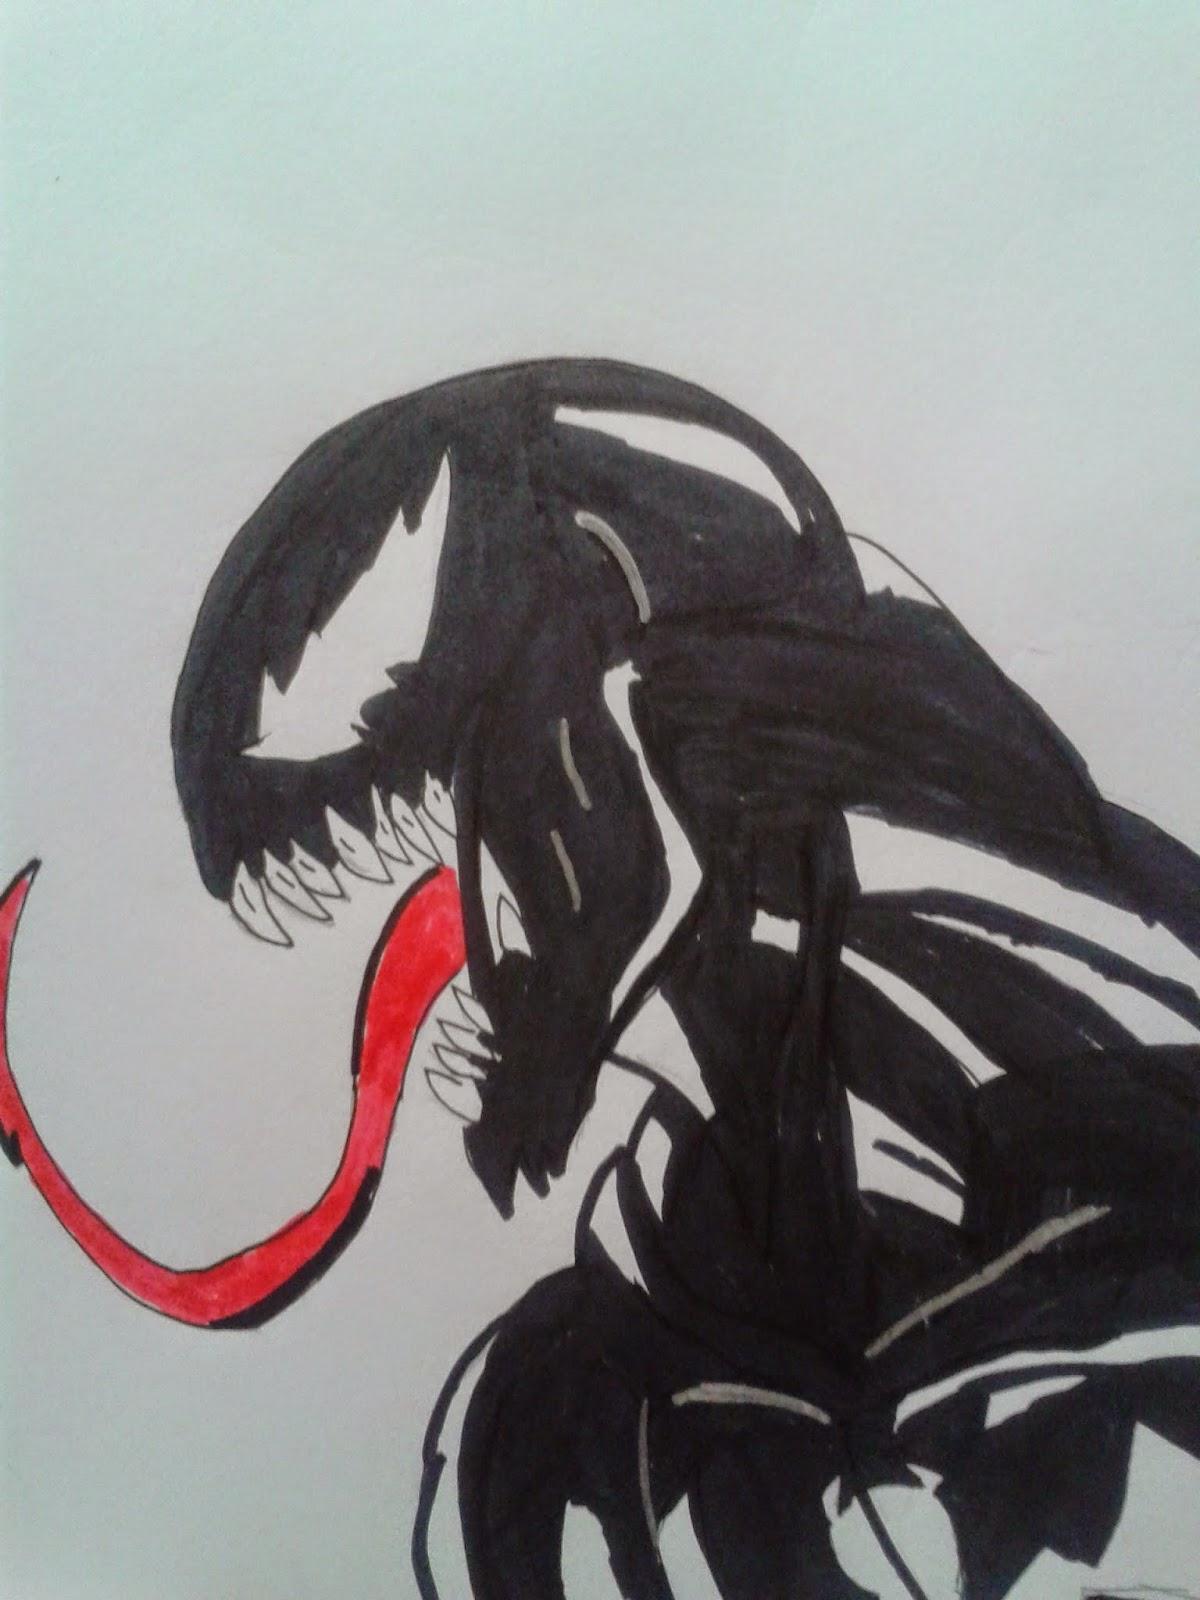 Read Venom comics digitally on any iOS and Android device using comiXology